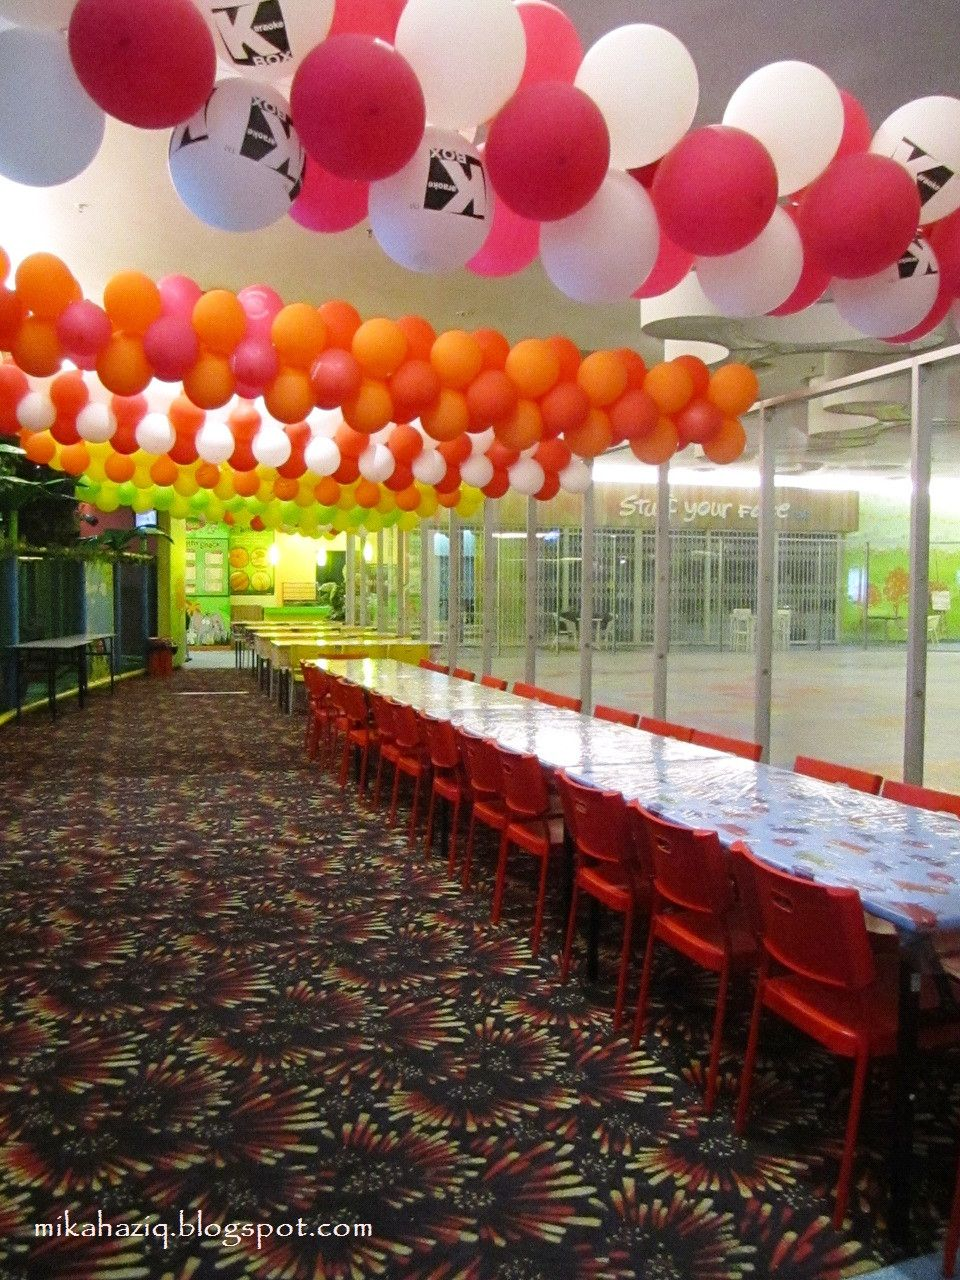 Indoor Play Jungle Gym Bangsar The Top 20 Ideas About Birthday Party Venues Birthday Party Venues Party Venues Kids Birthday Party Places